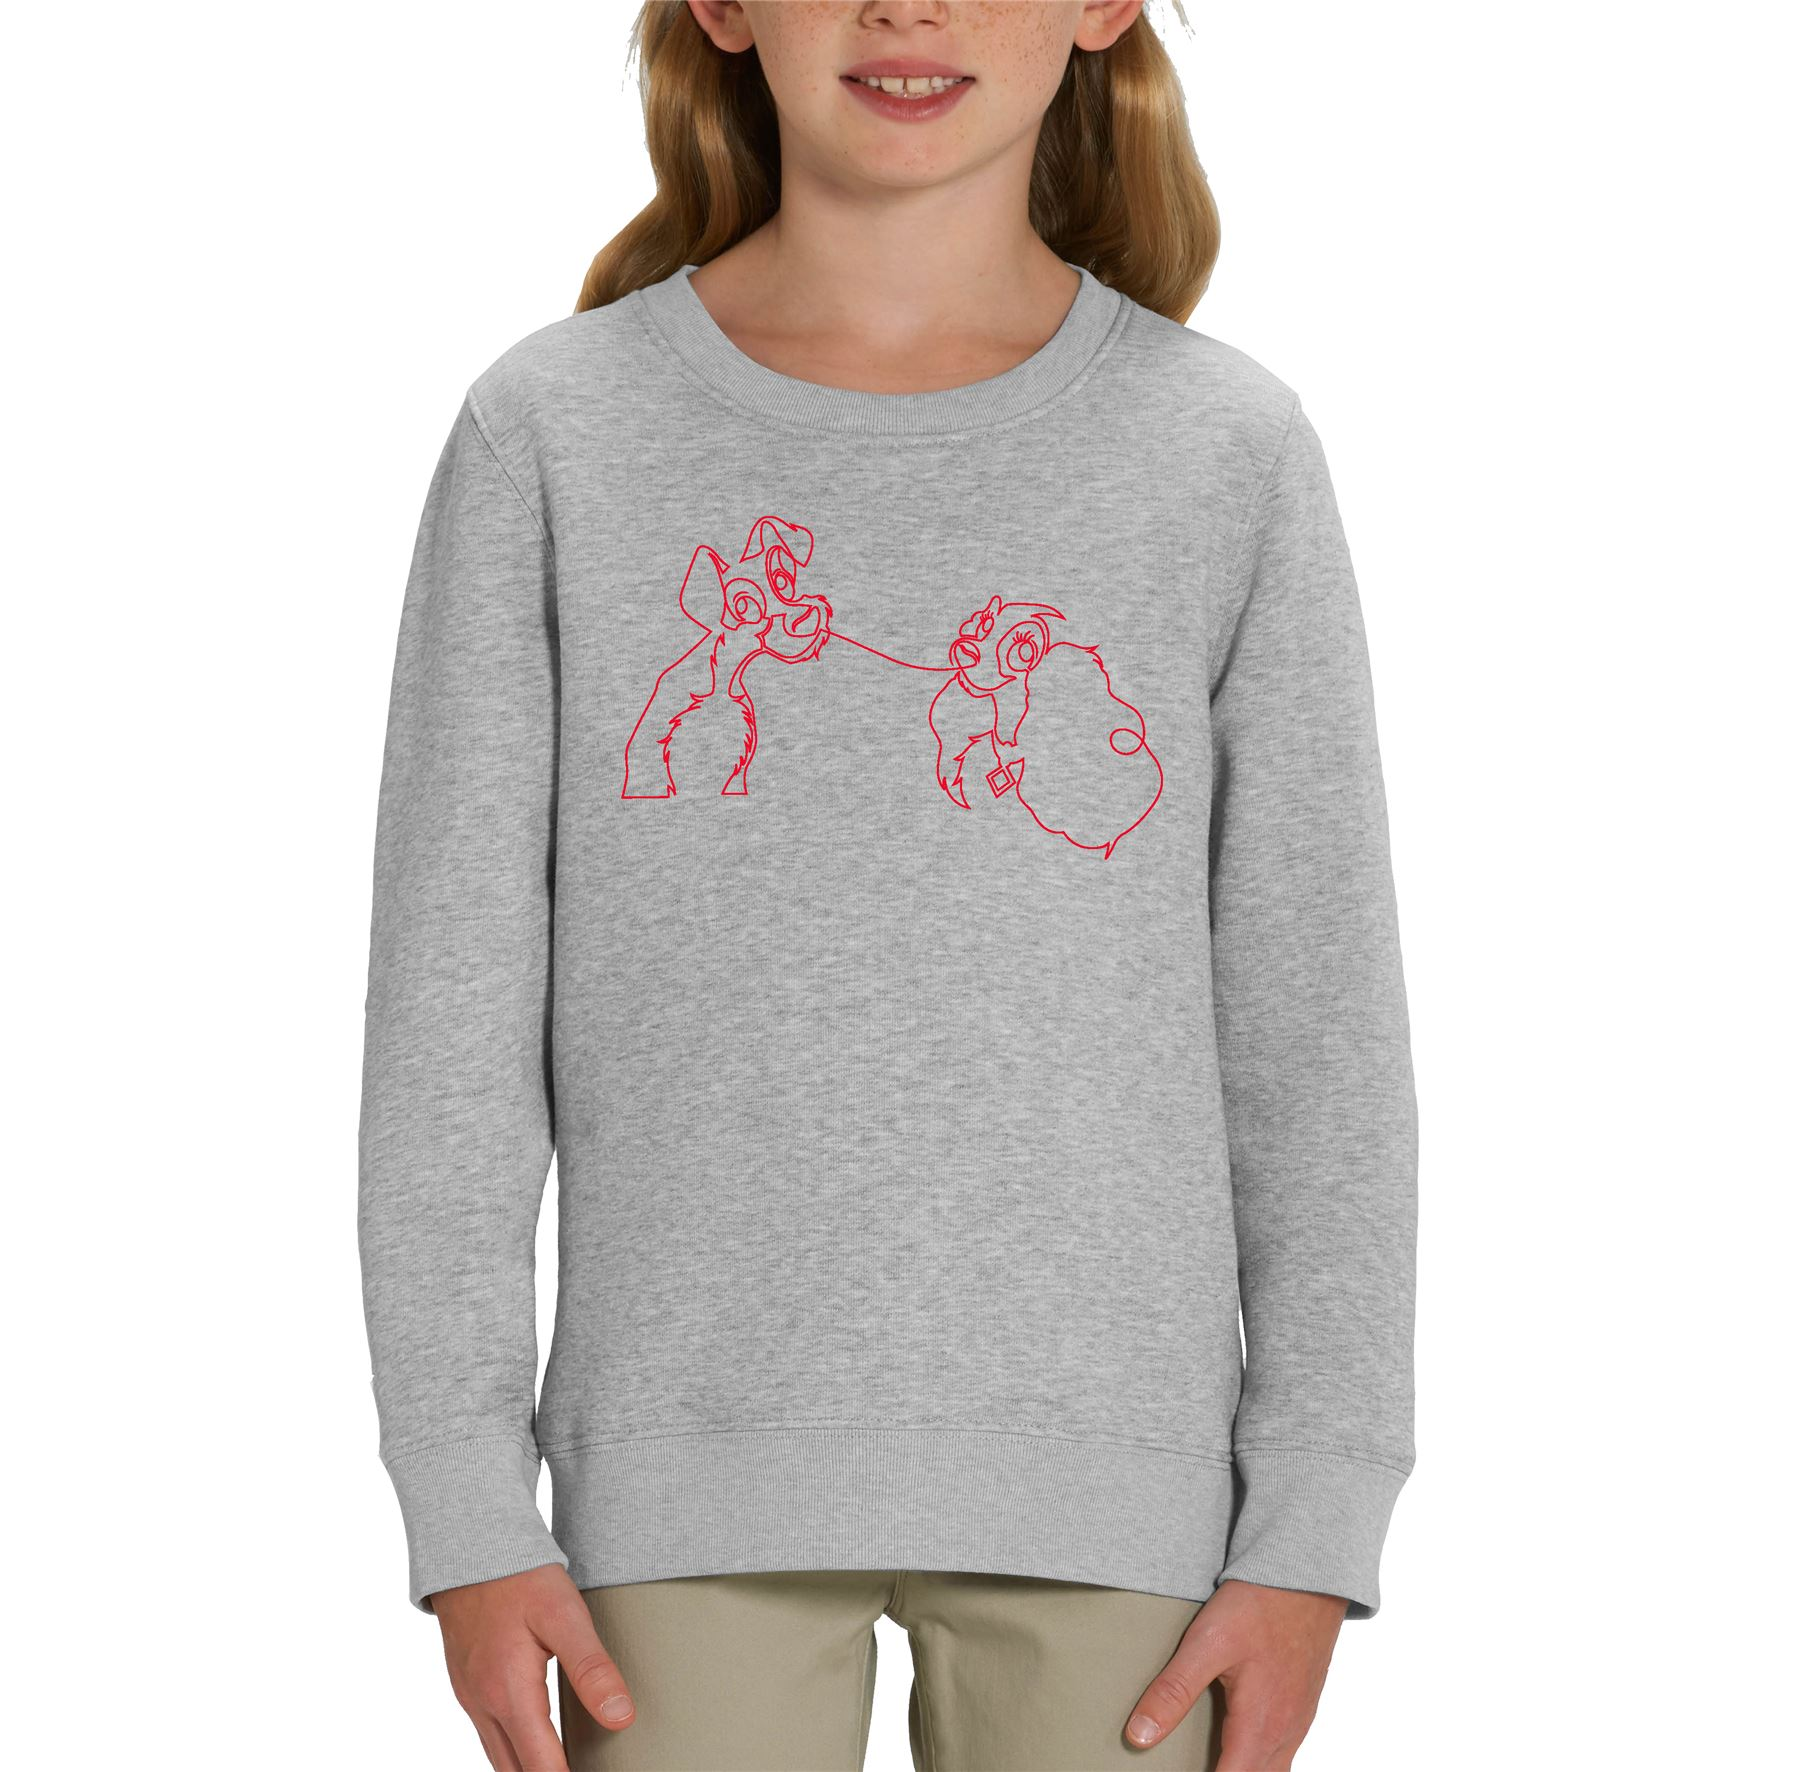 Disney Classic Lady The Tramp Outline Children S Unisex Grey Sweatshirt Ebay